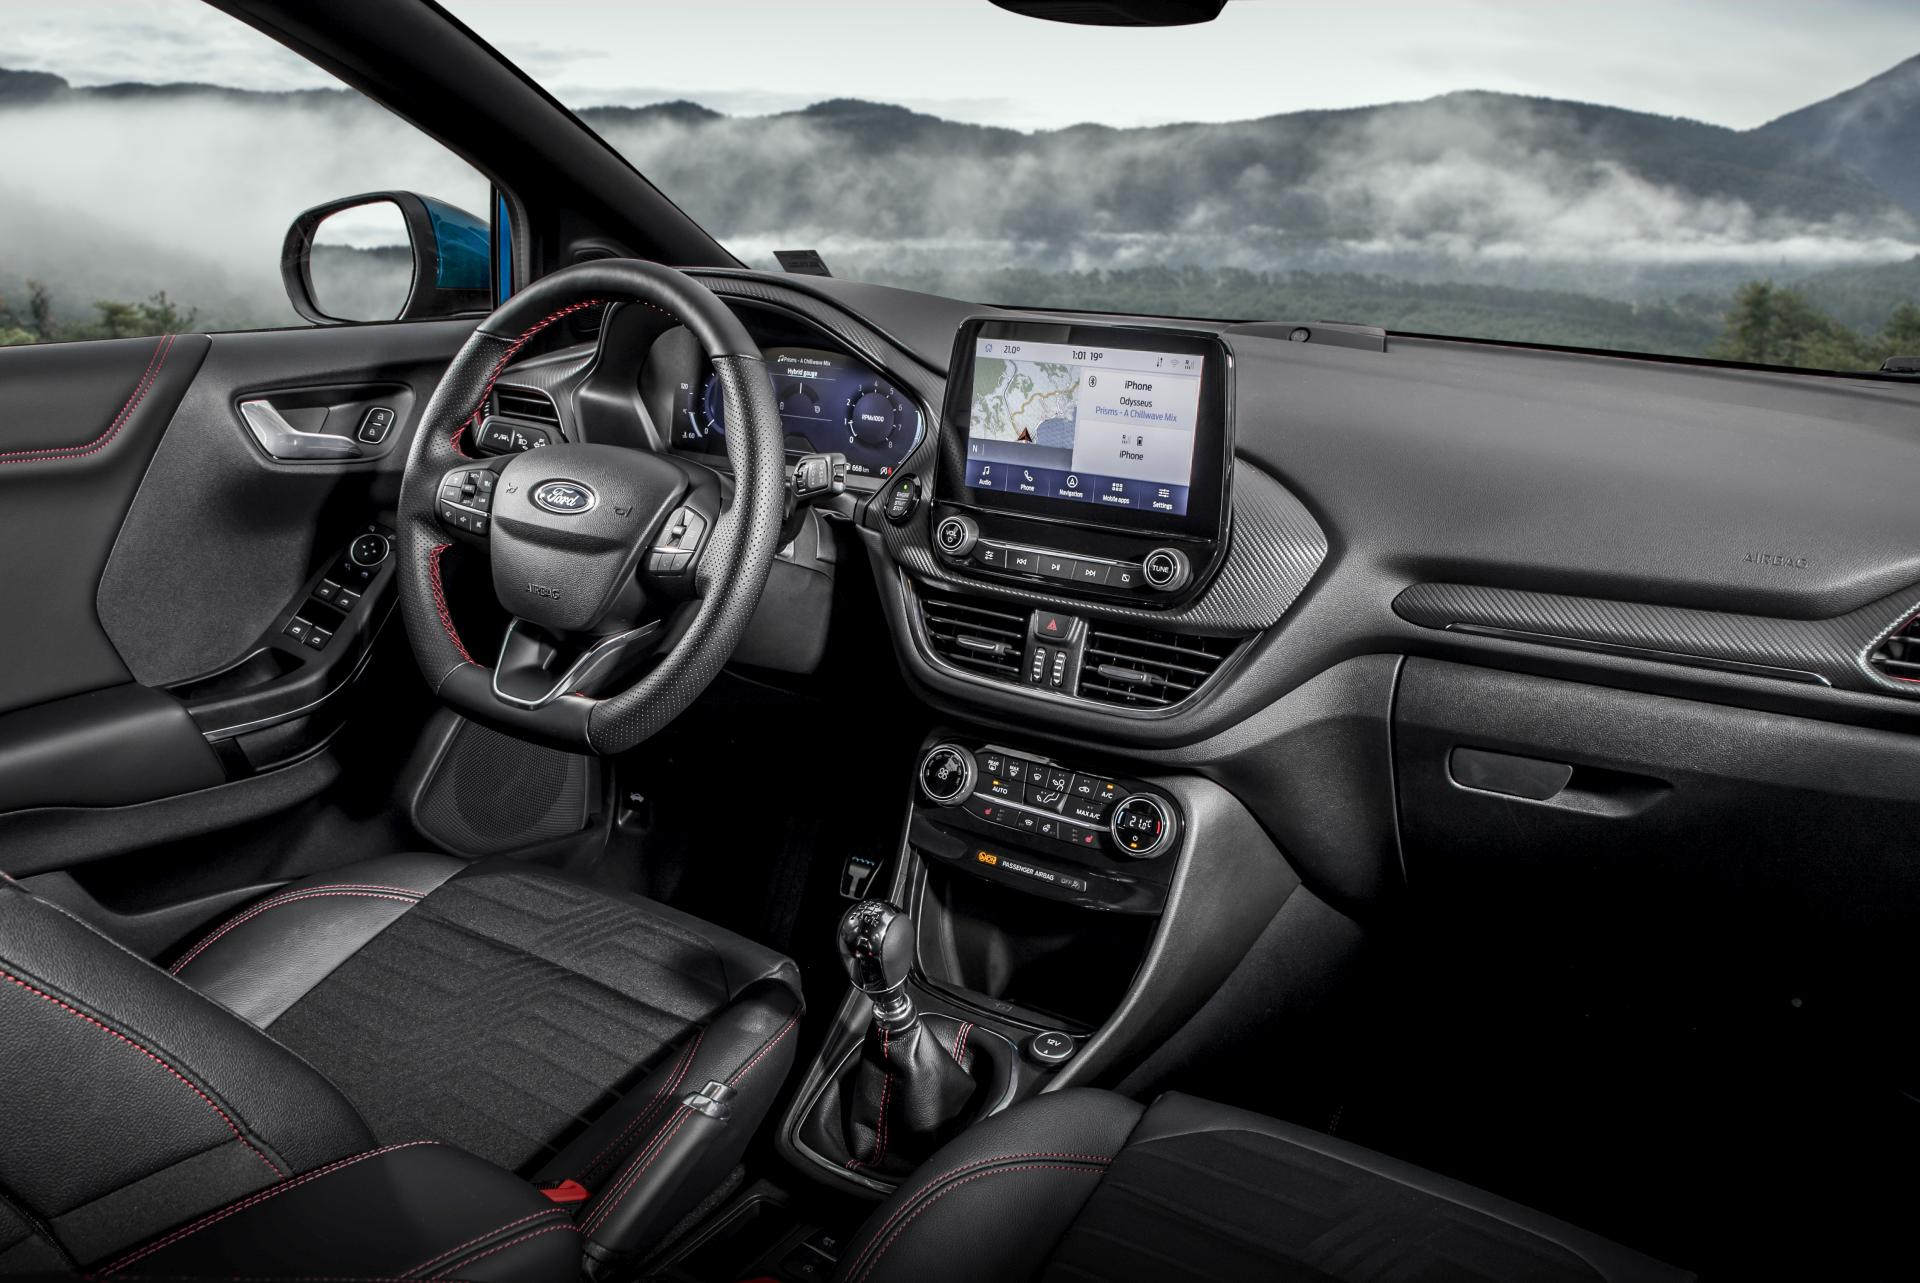 Ford Puma 1.0 EcoBoost Hybrid interior